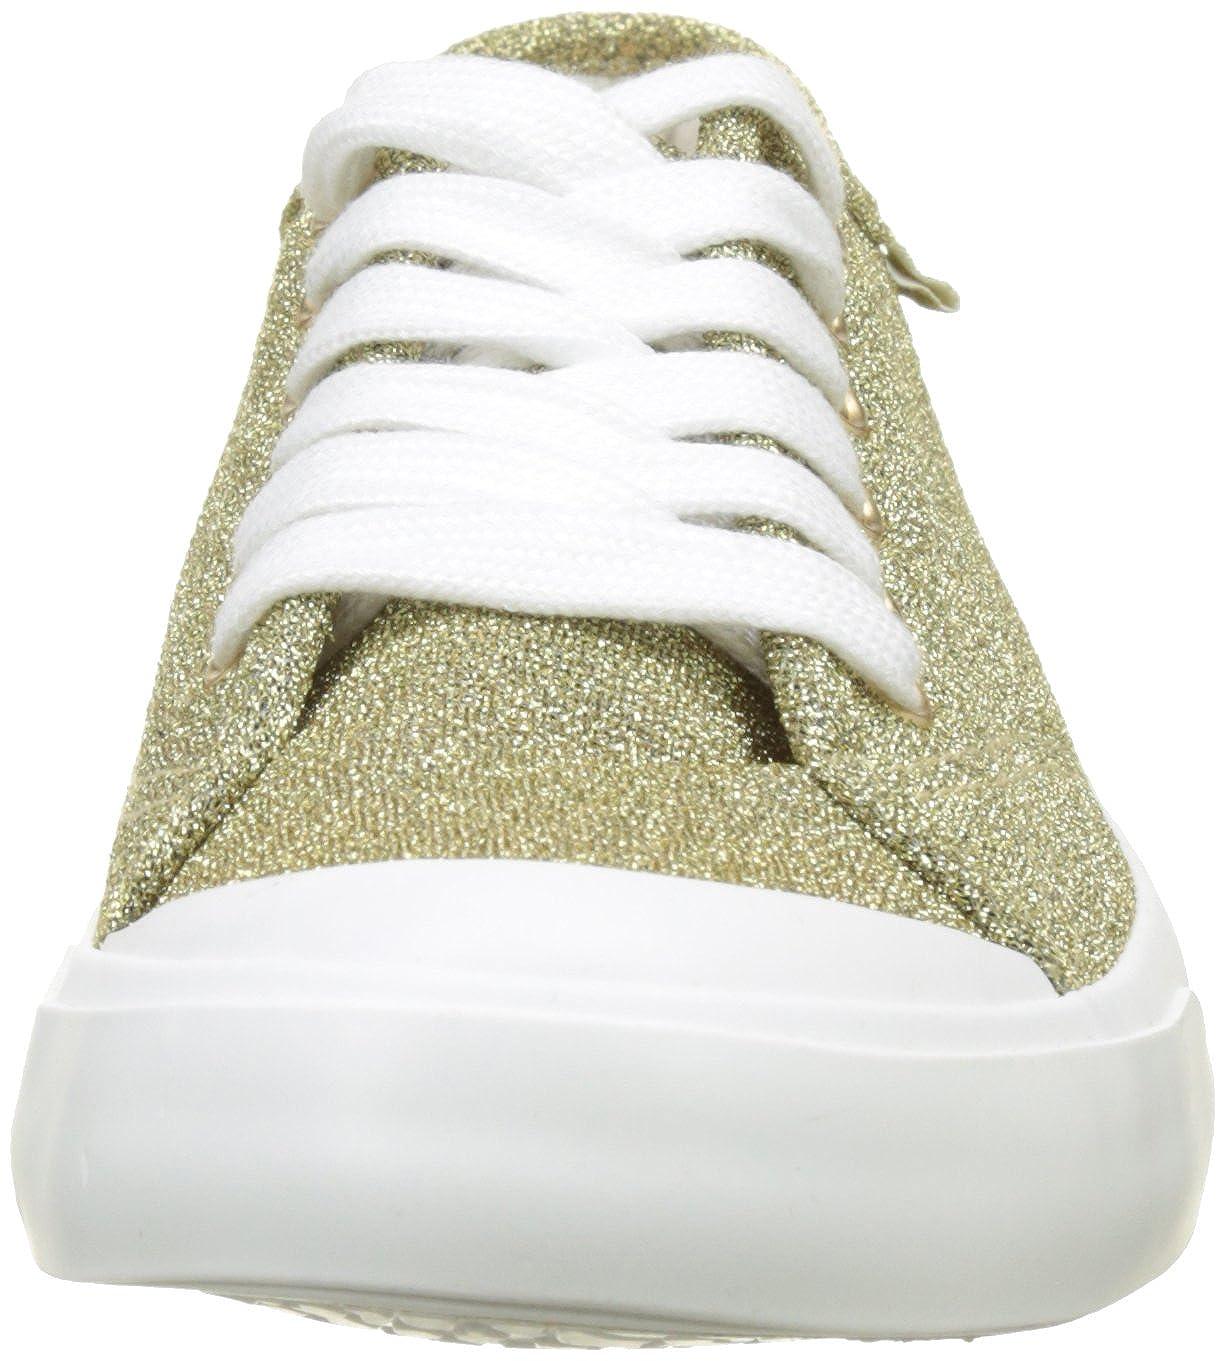 Rocket Dog Damen Jumpin Sneaker, Sneaker, Jumpin Gold (Goldfarben) 143021